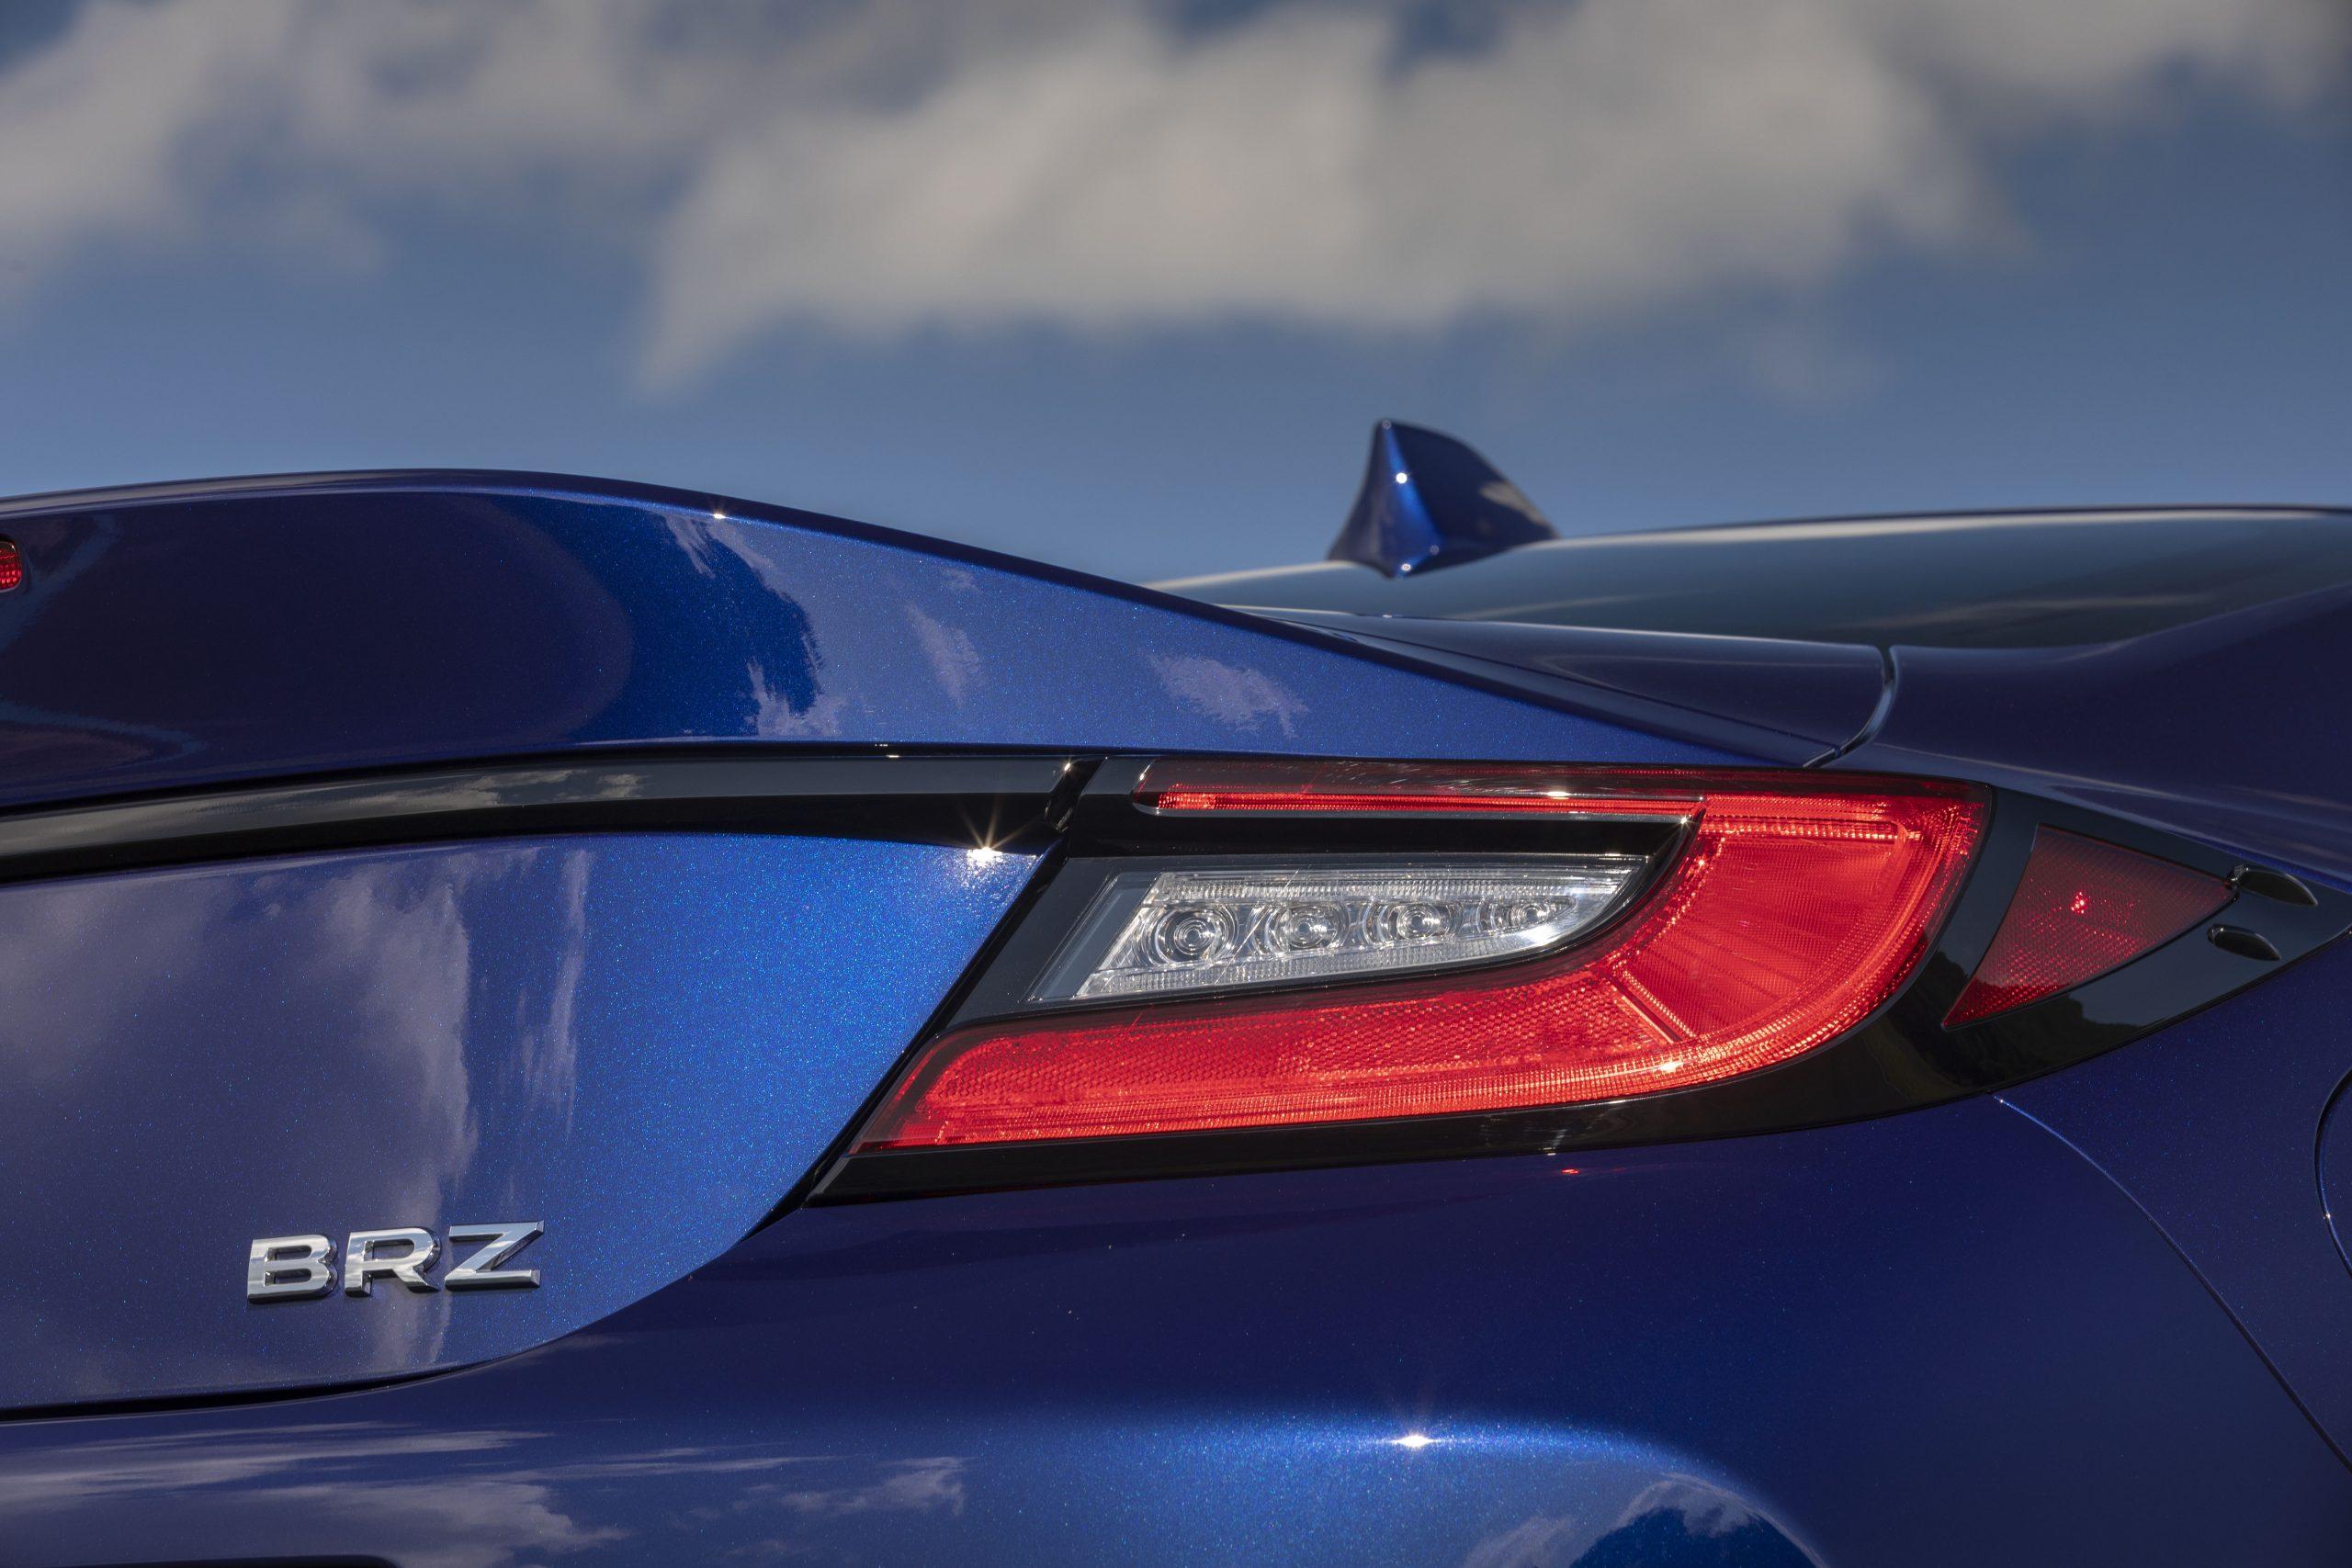 2022 Subaru BRZ rear taillight and badge